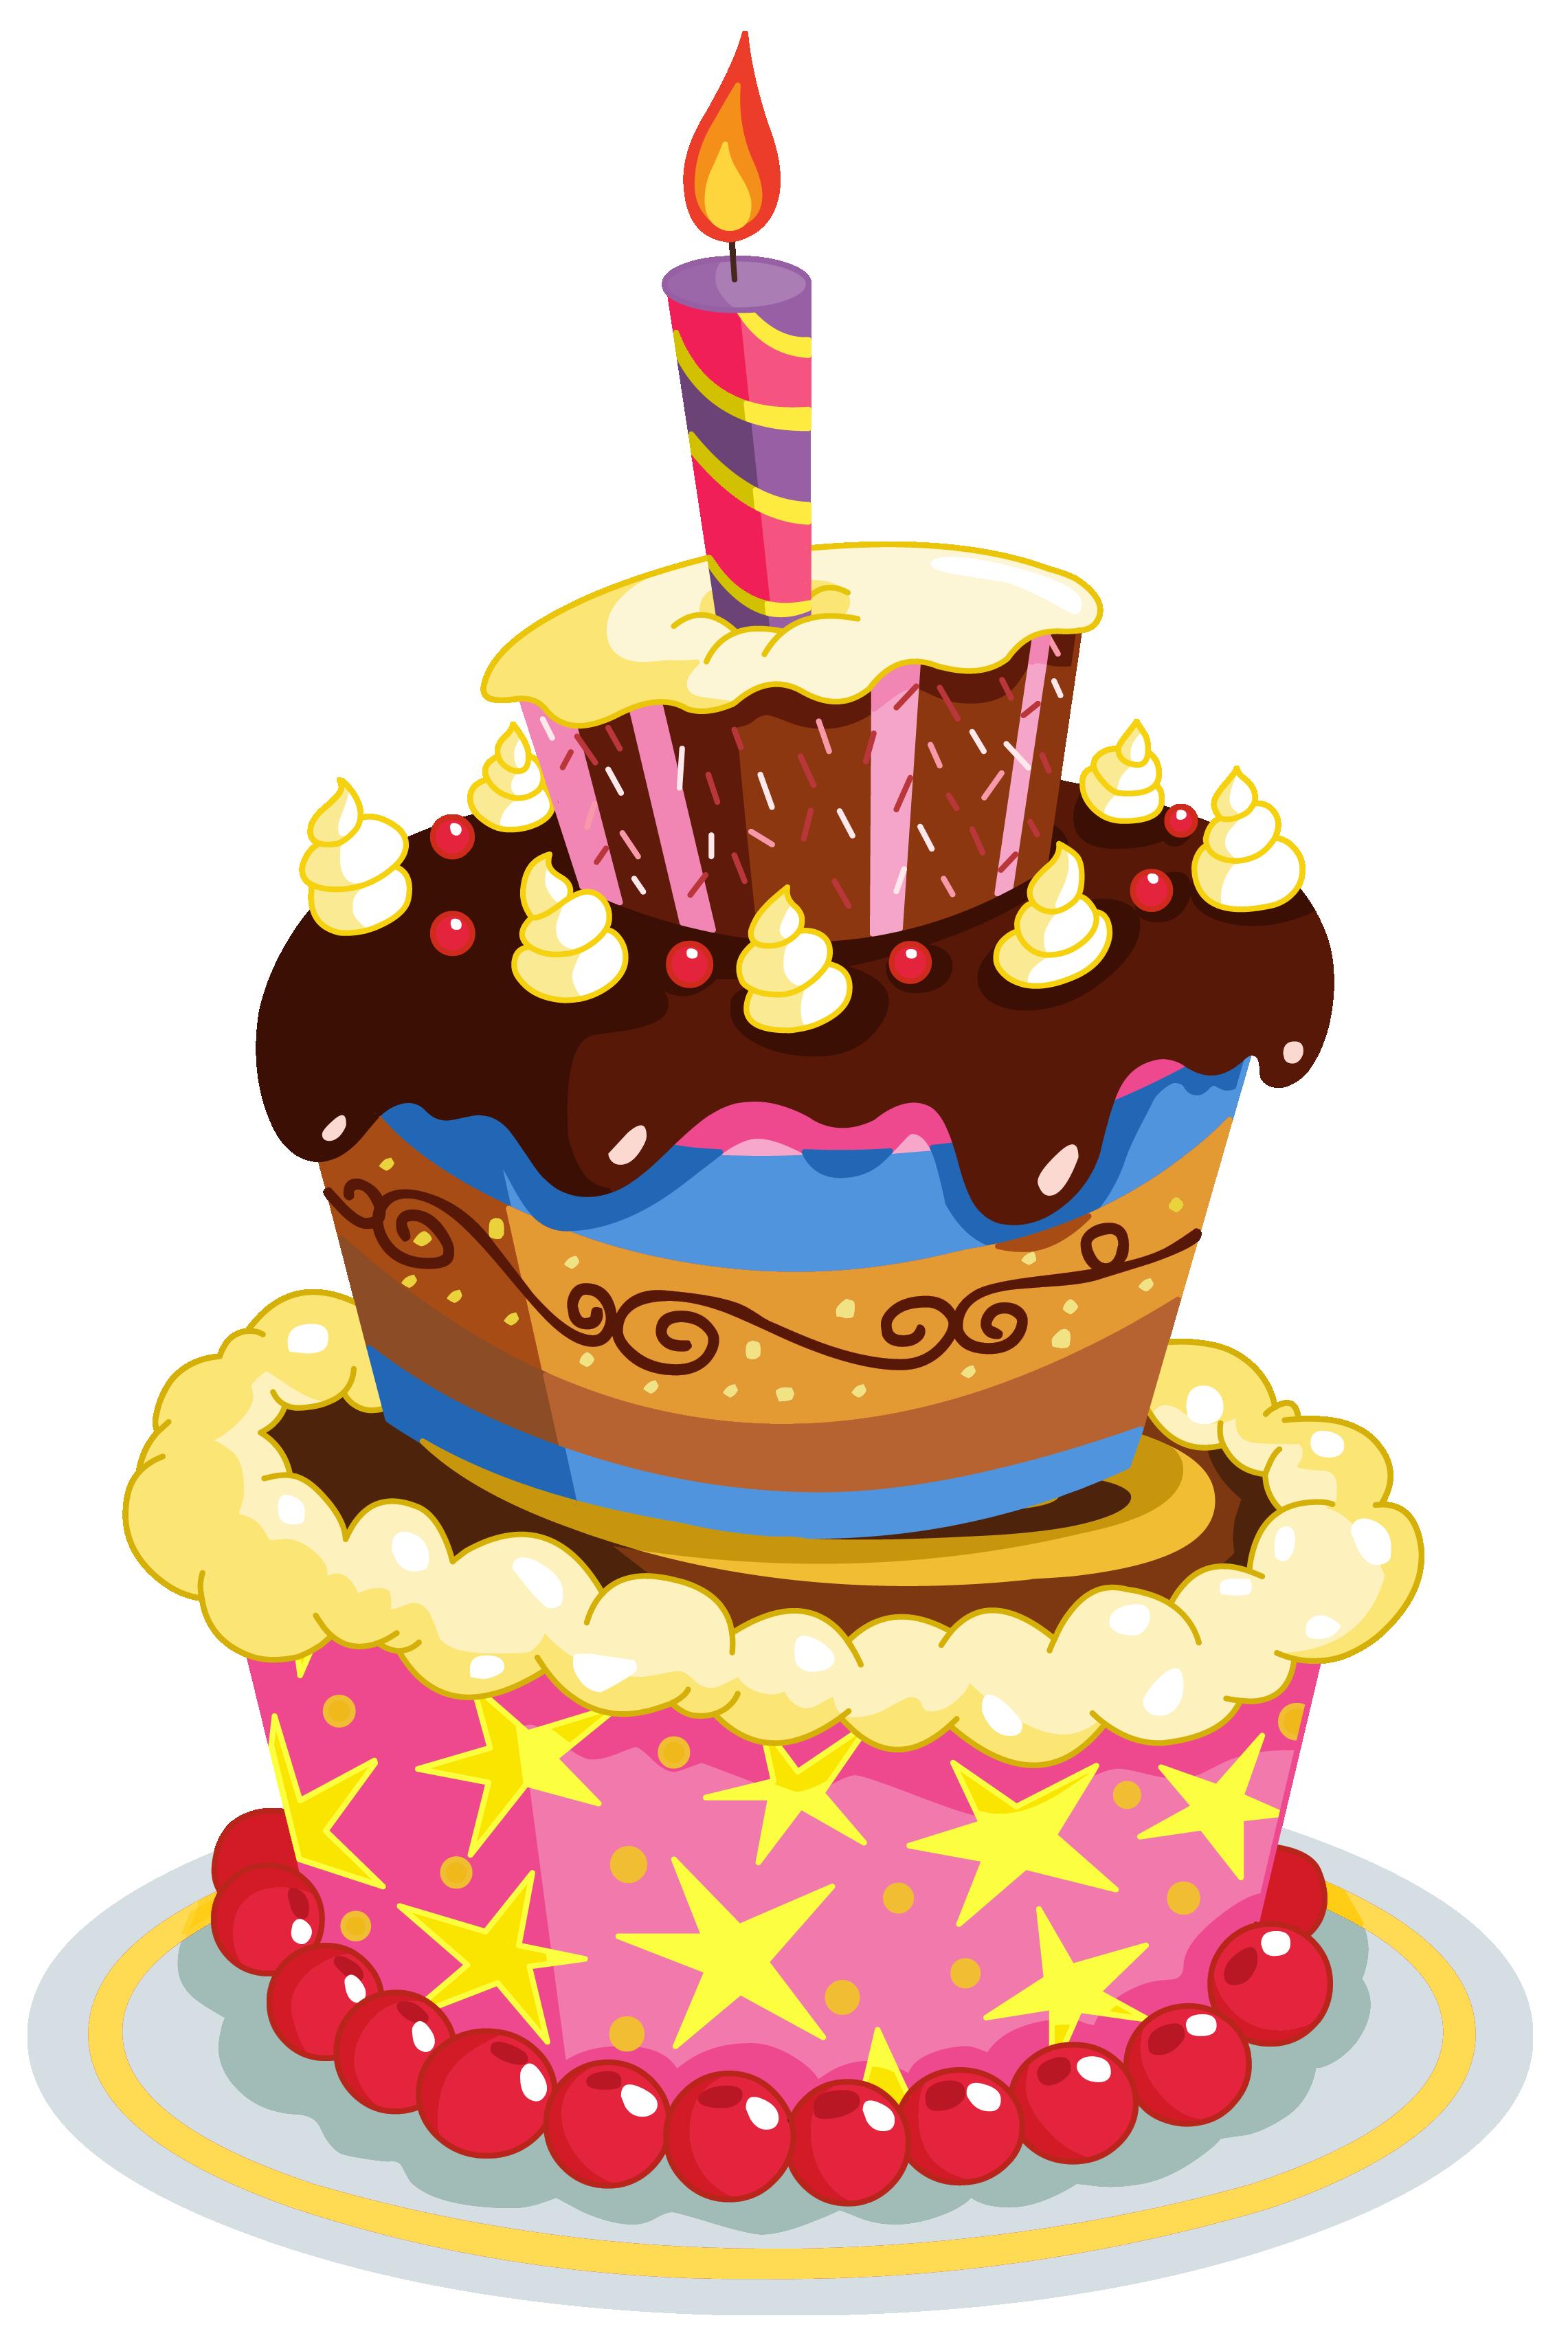 2282x3405 Cake Png